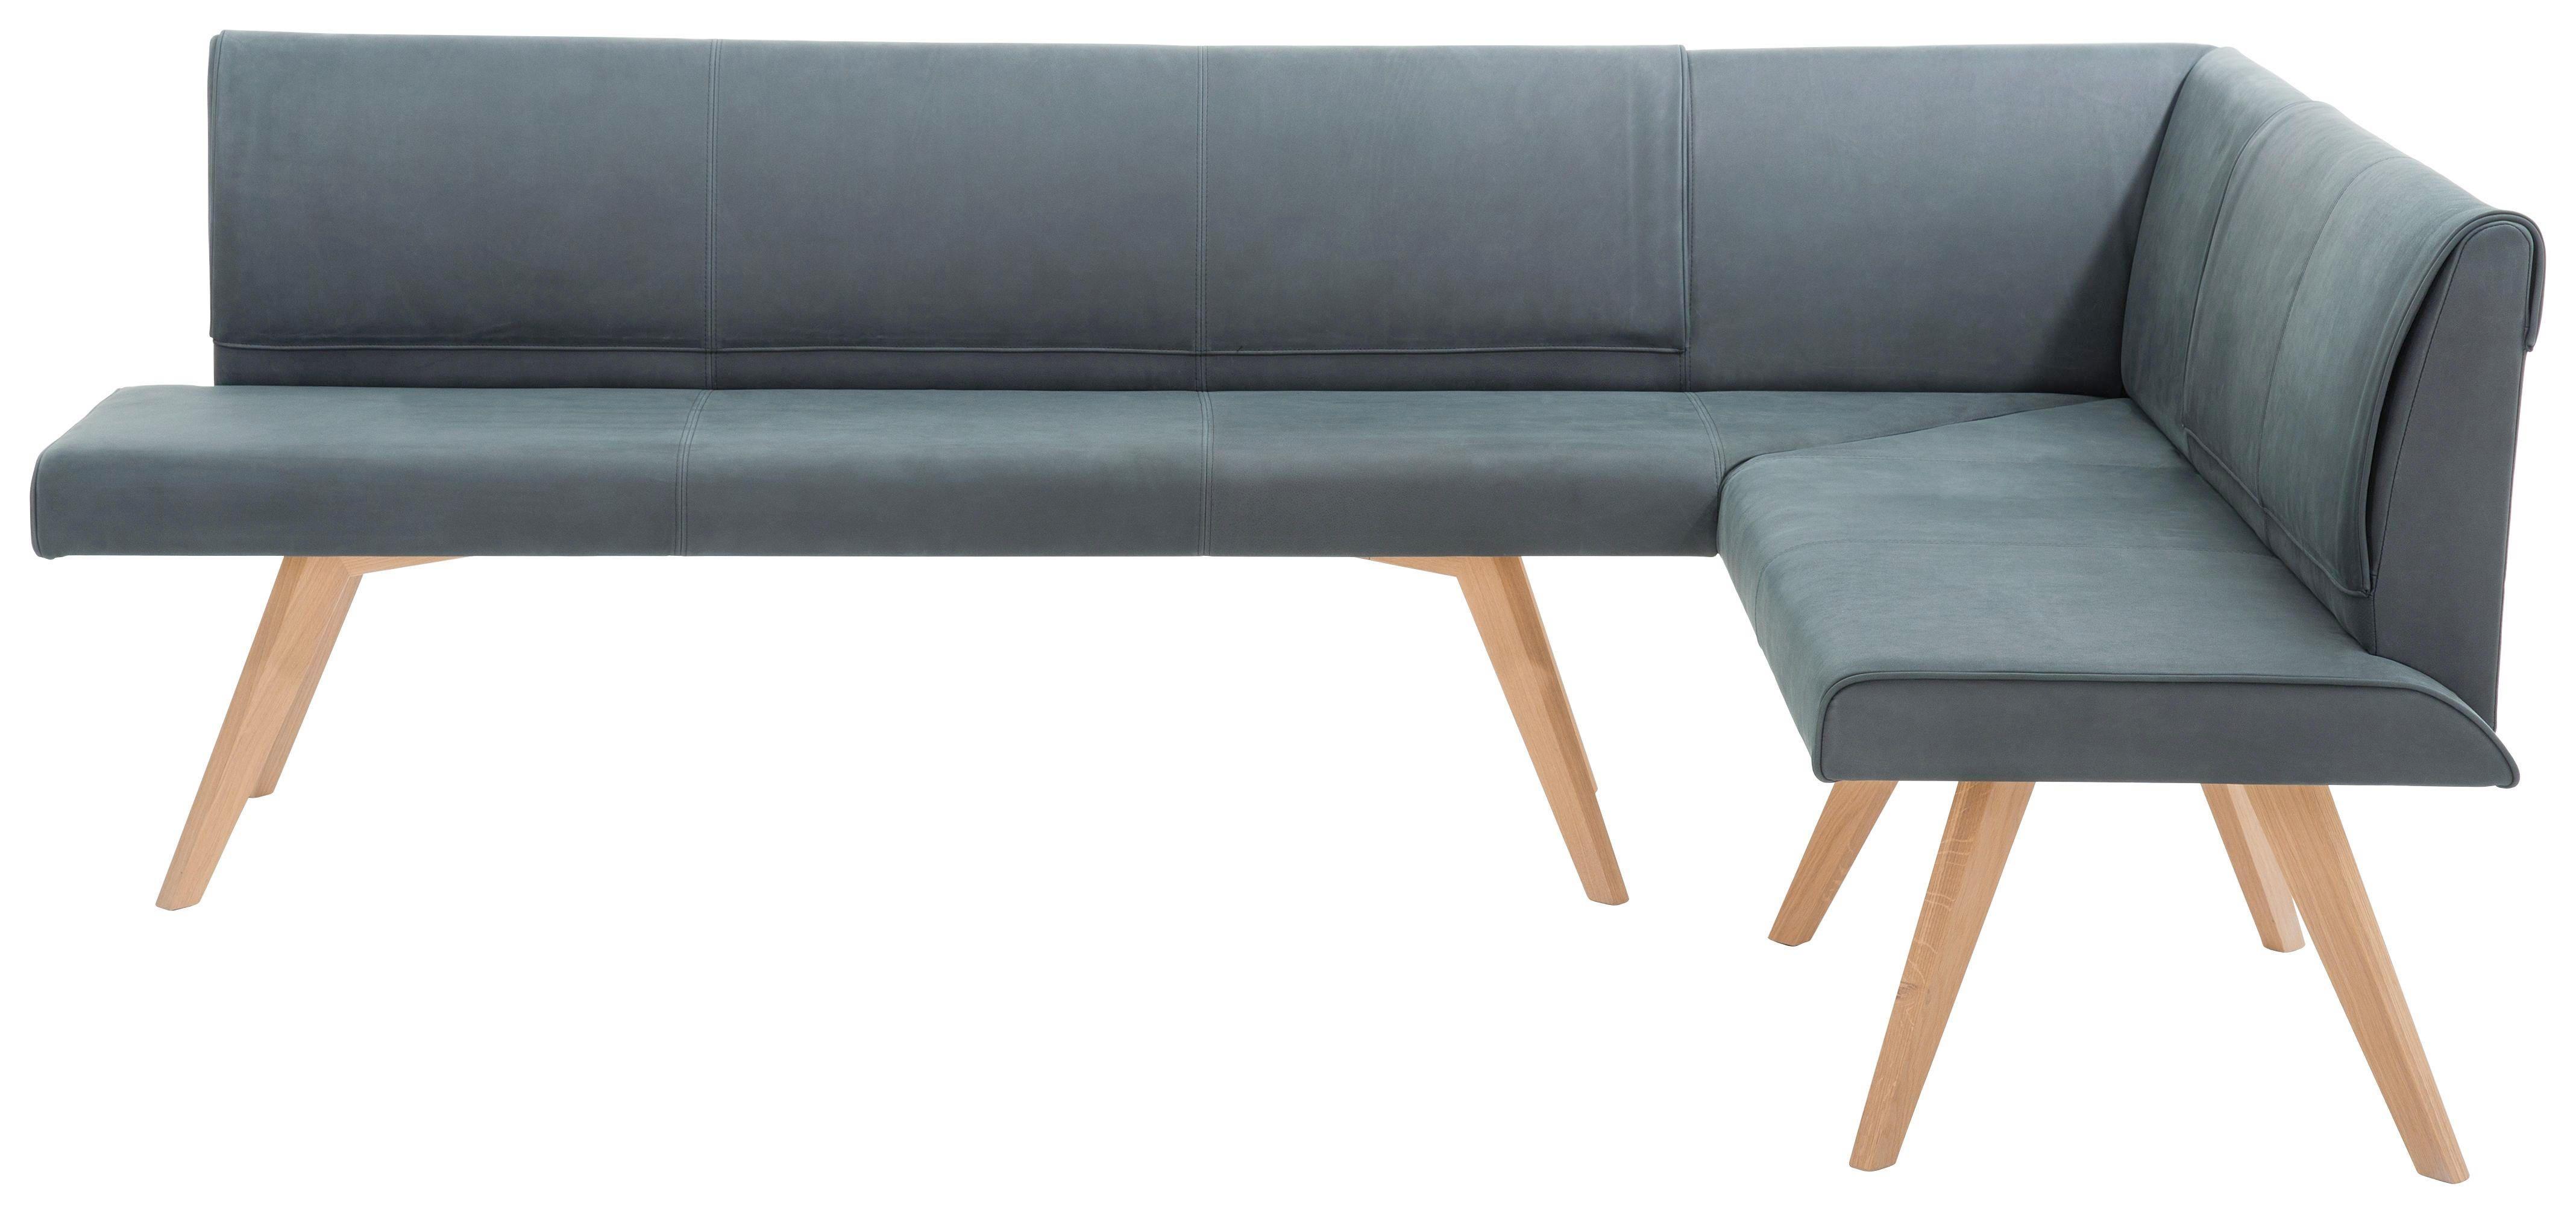 Pin By Veronica Ferreira On Casa Home Decor Furniture Scandinavian Decor